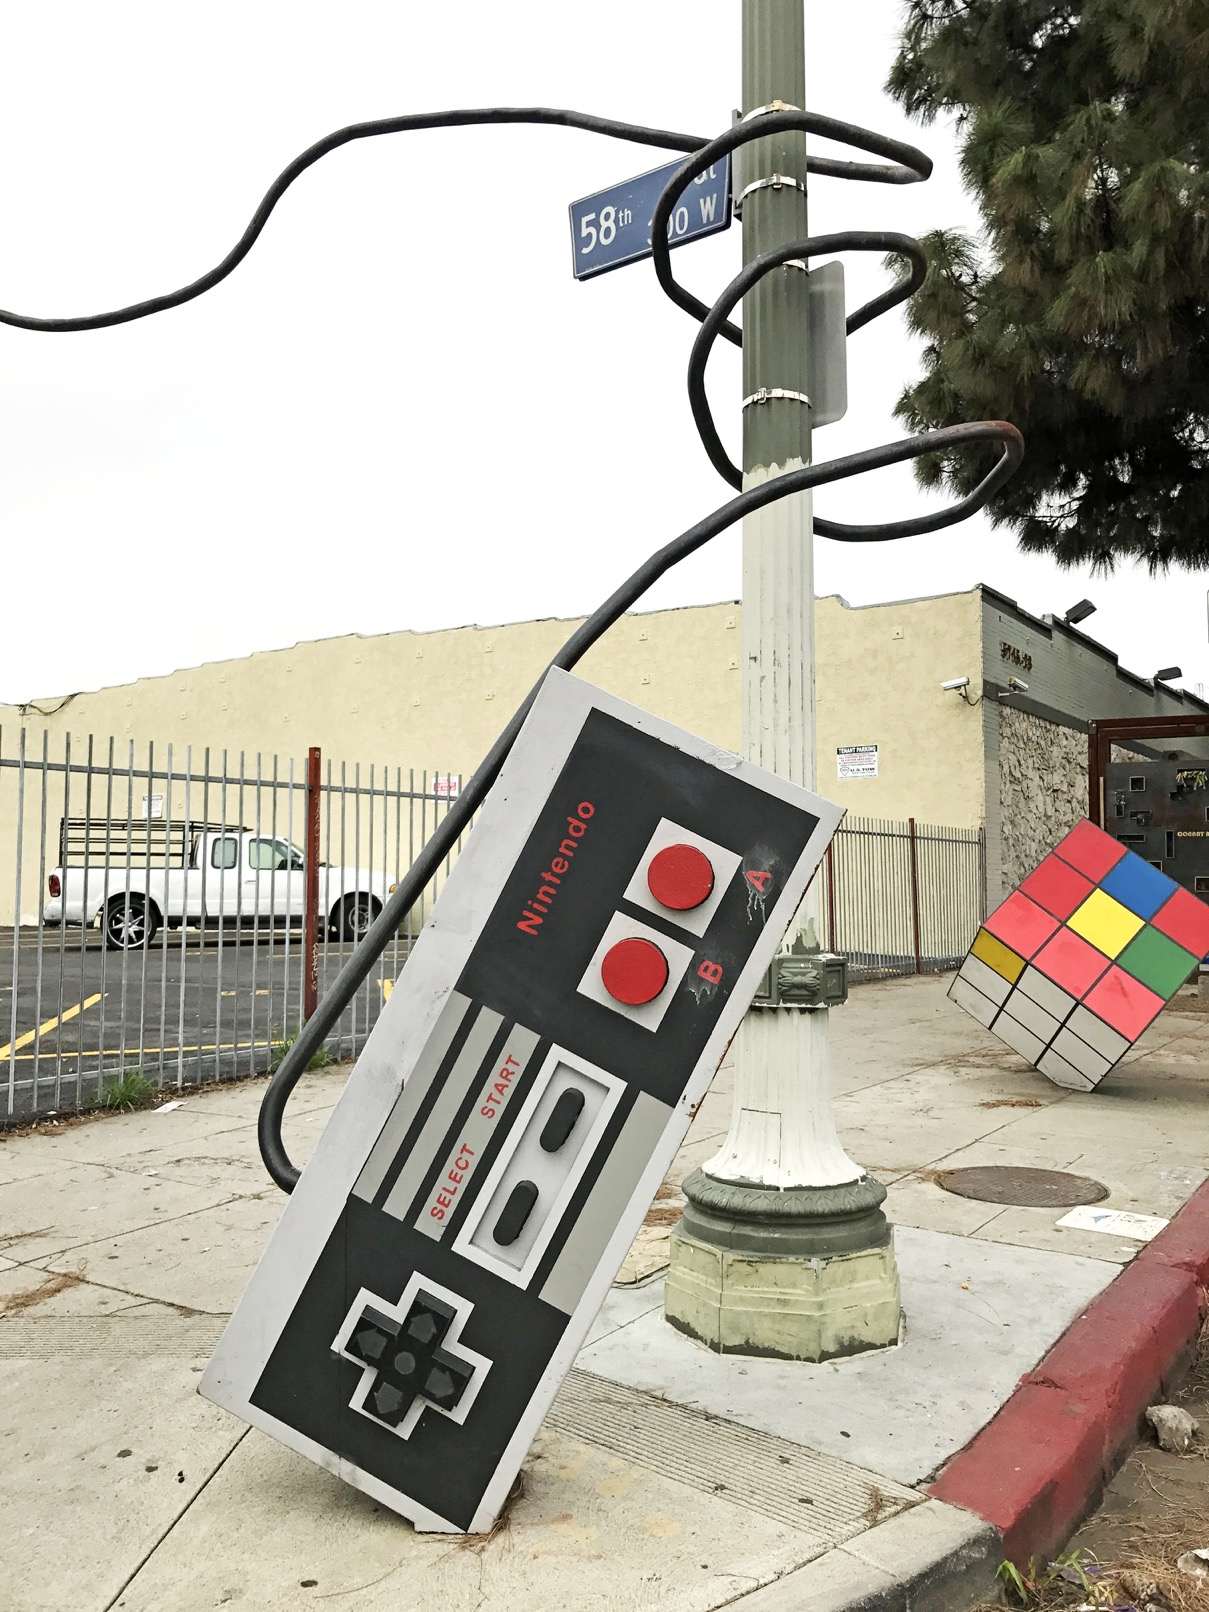 Sightings in South LA